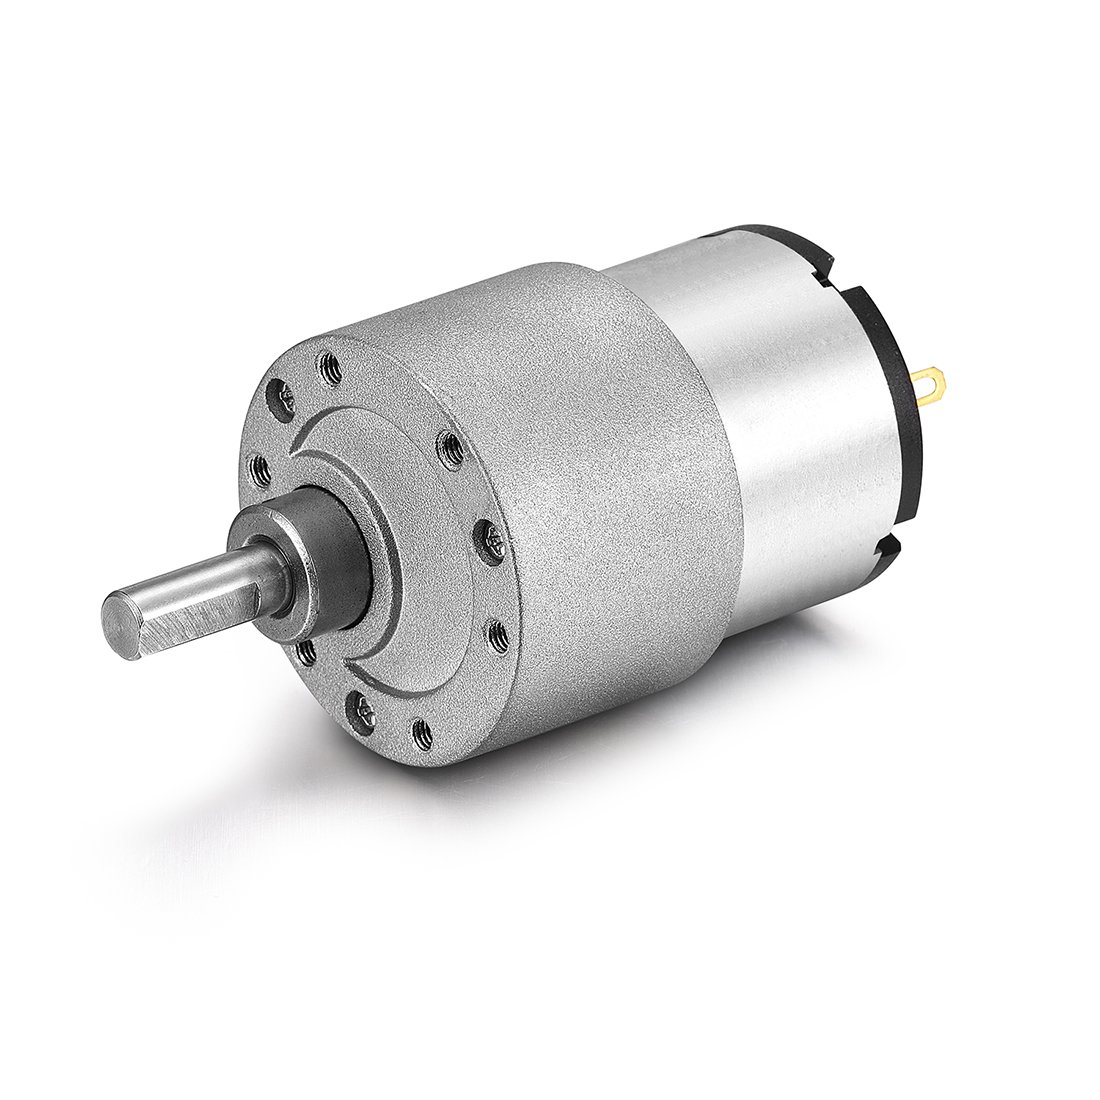 uxcell Mini 12V DC 3.5 RPM 78N.cm High Torque Gear Box Electric Motor